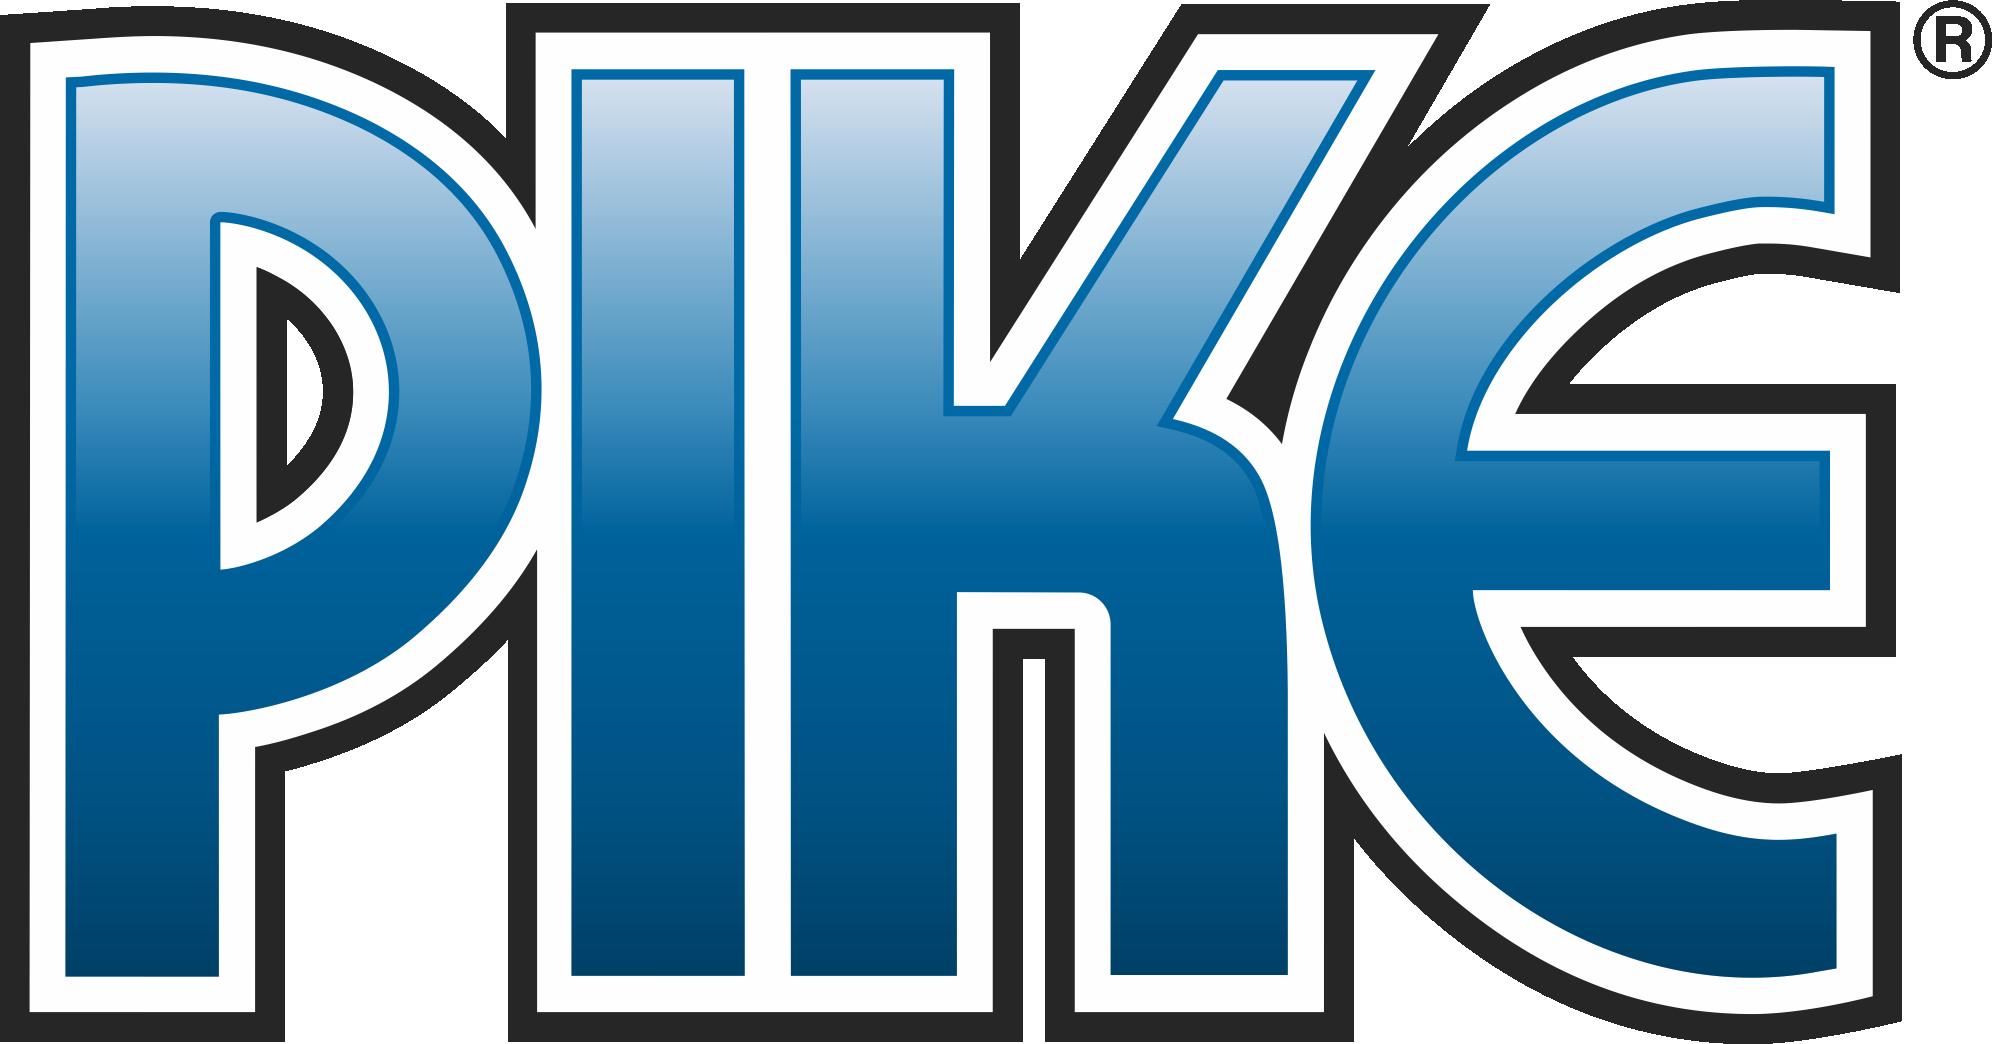 Pike Corp logo